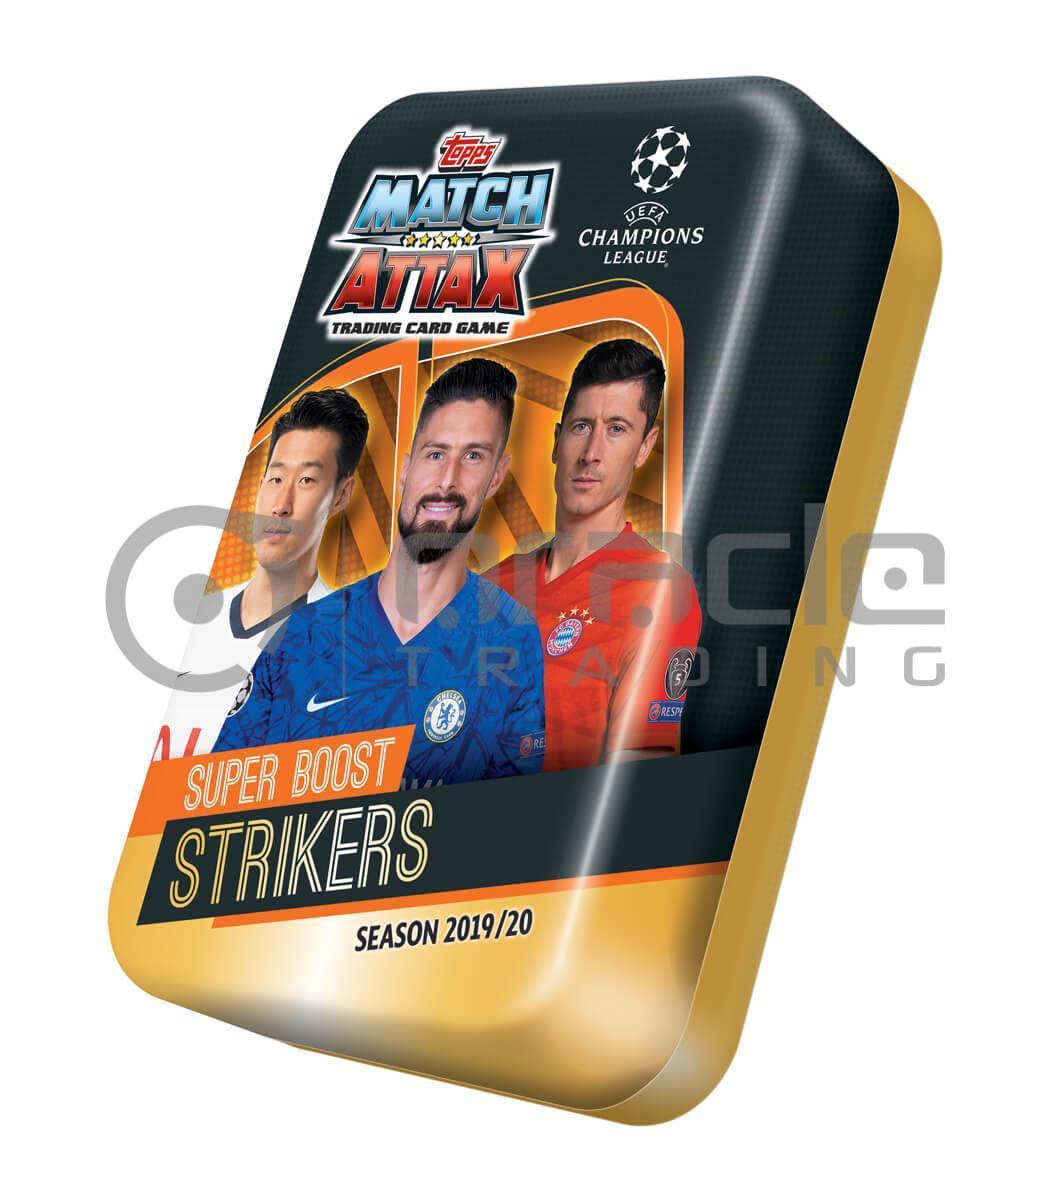 2019-20 Topps Match-Attax Champions League Cards - Mega Tin